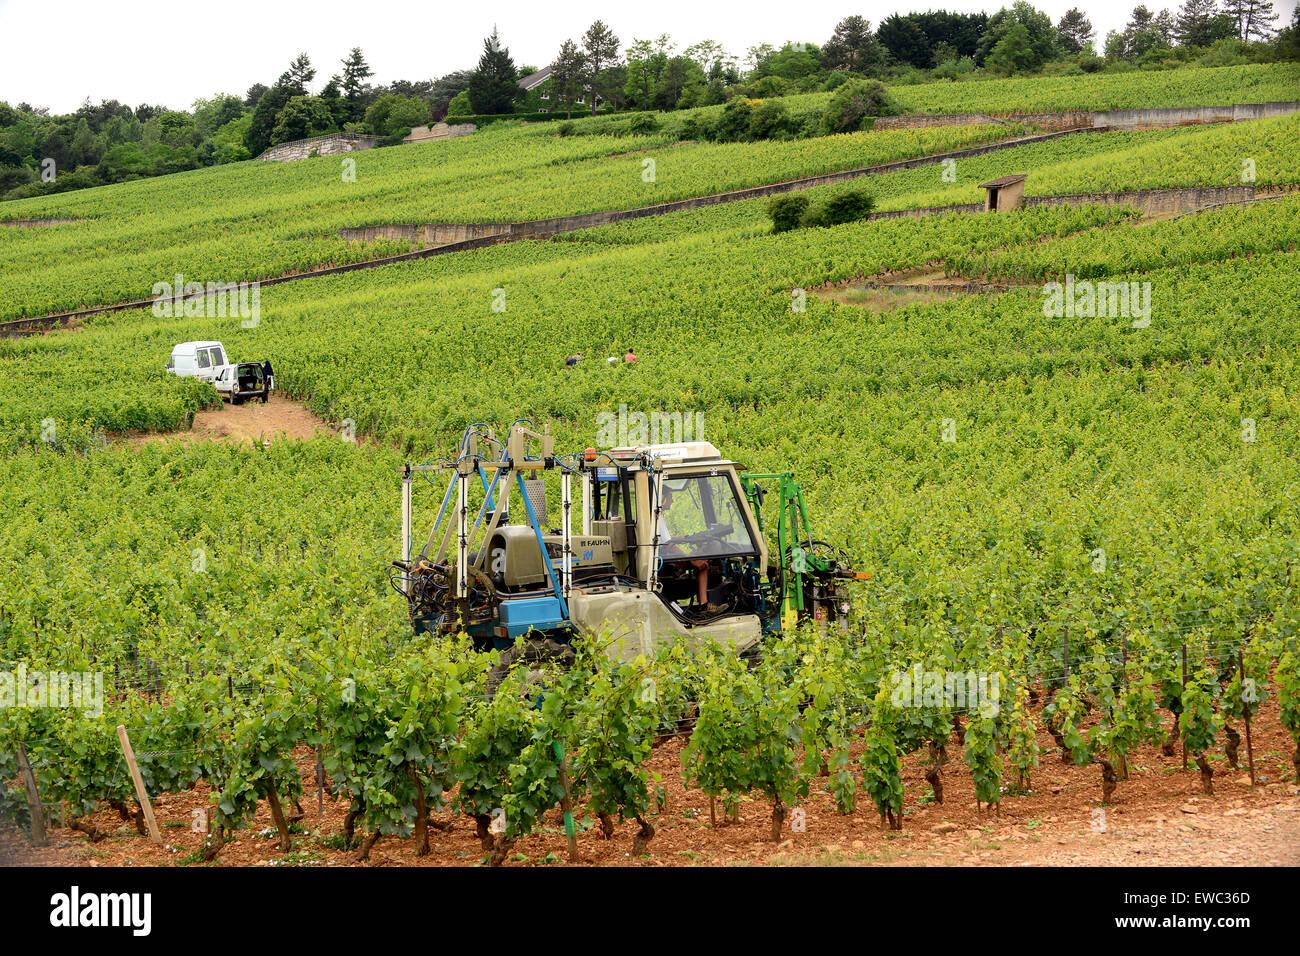 Mechanical vine trimming pruning Beaune Premier Cru vineyards in Burgundy France - Stock Image